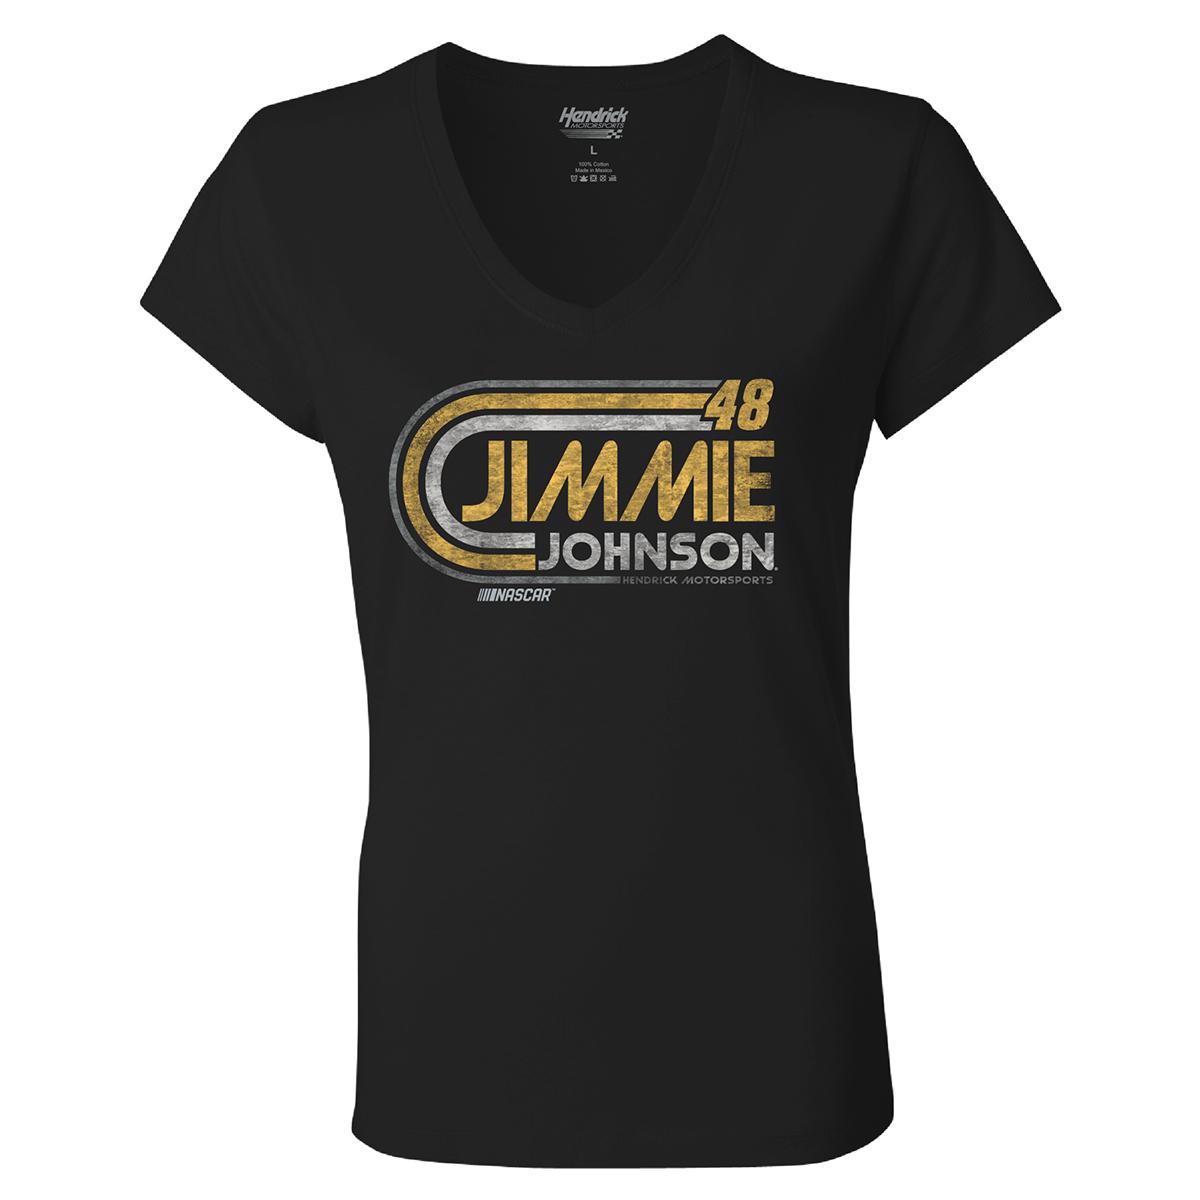 Jimmie Johnson #48 Ladies Retro 1-Spot T-shirt